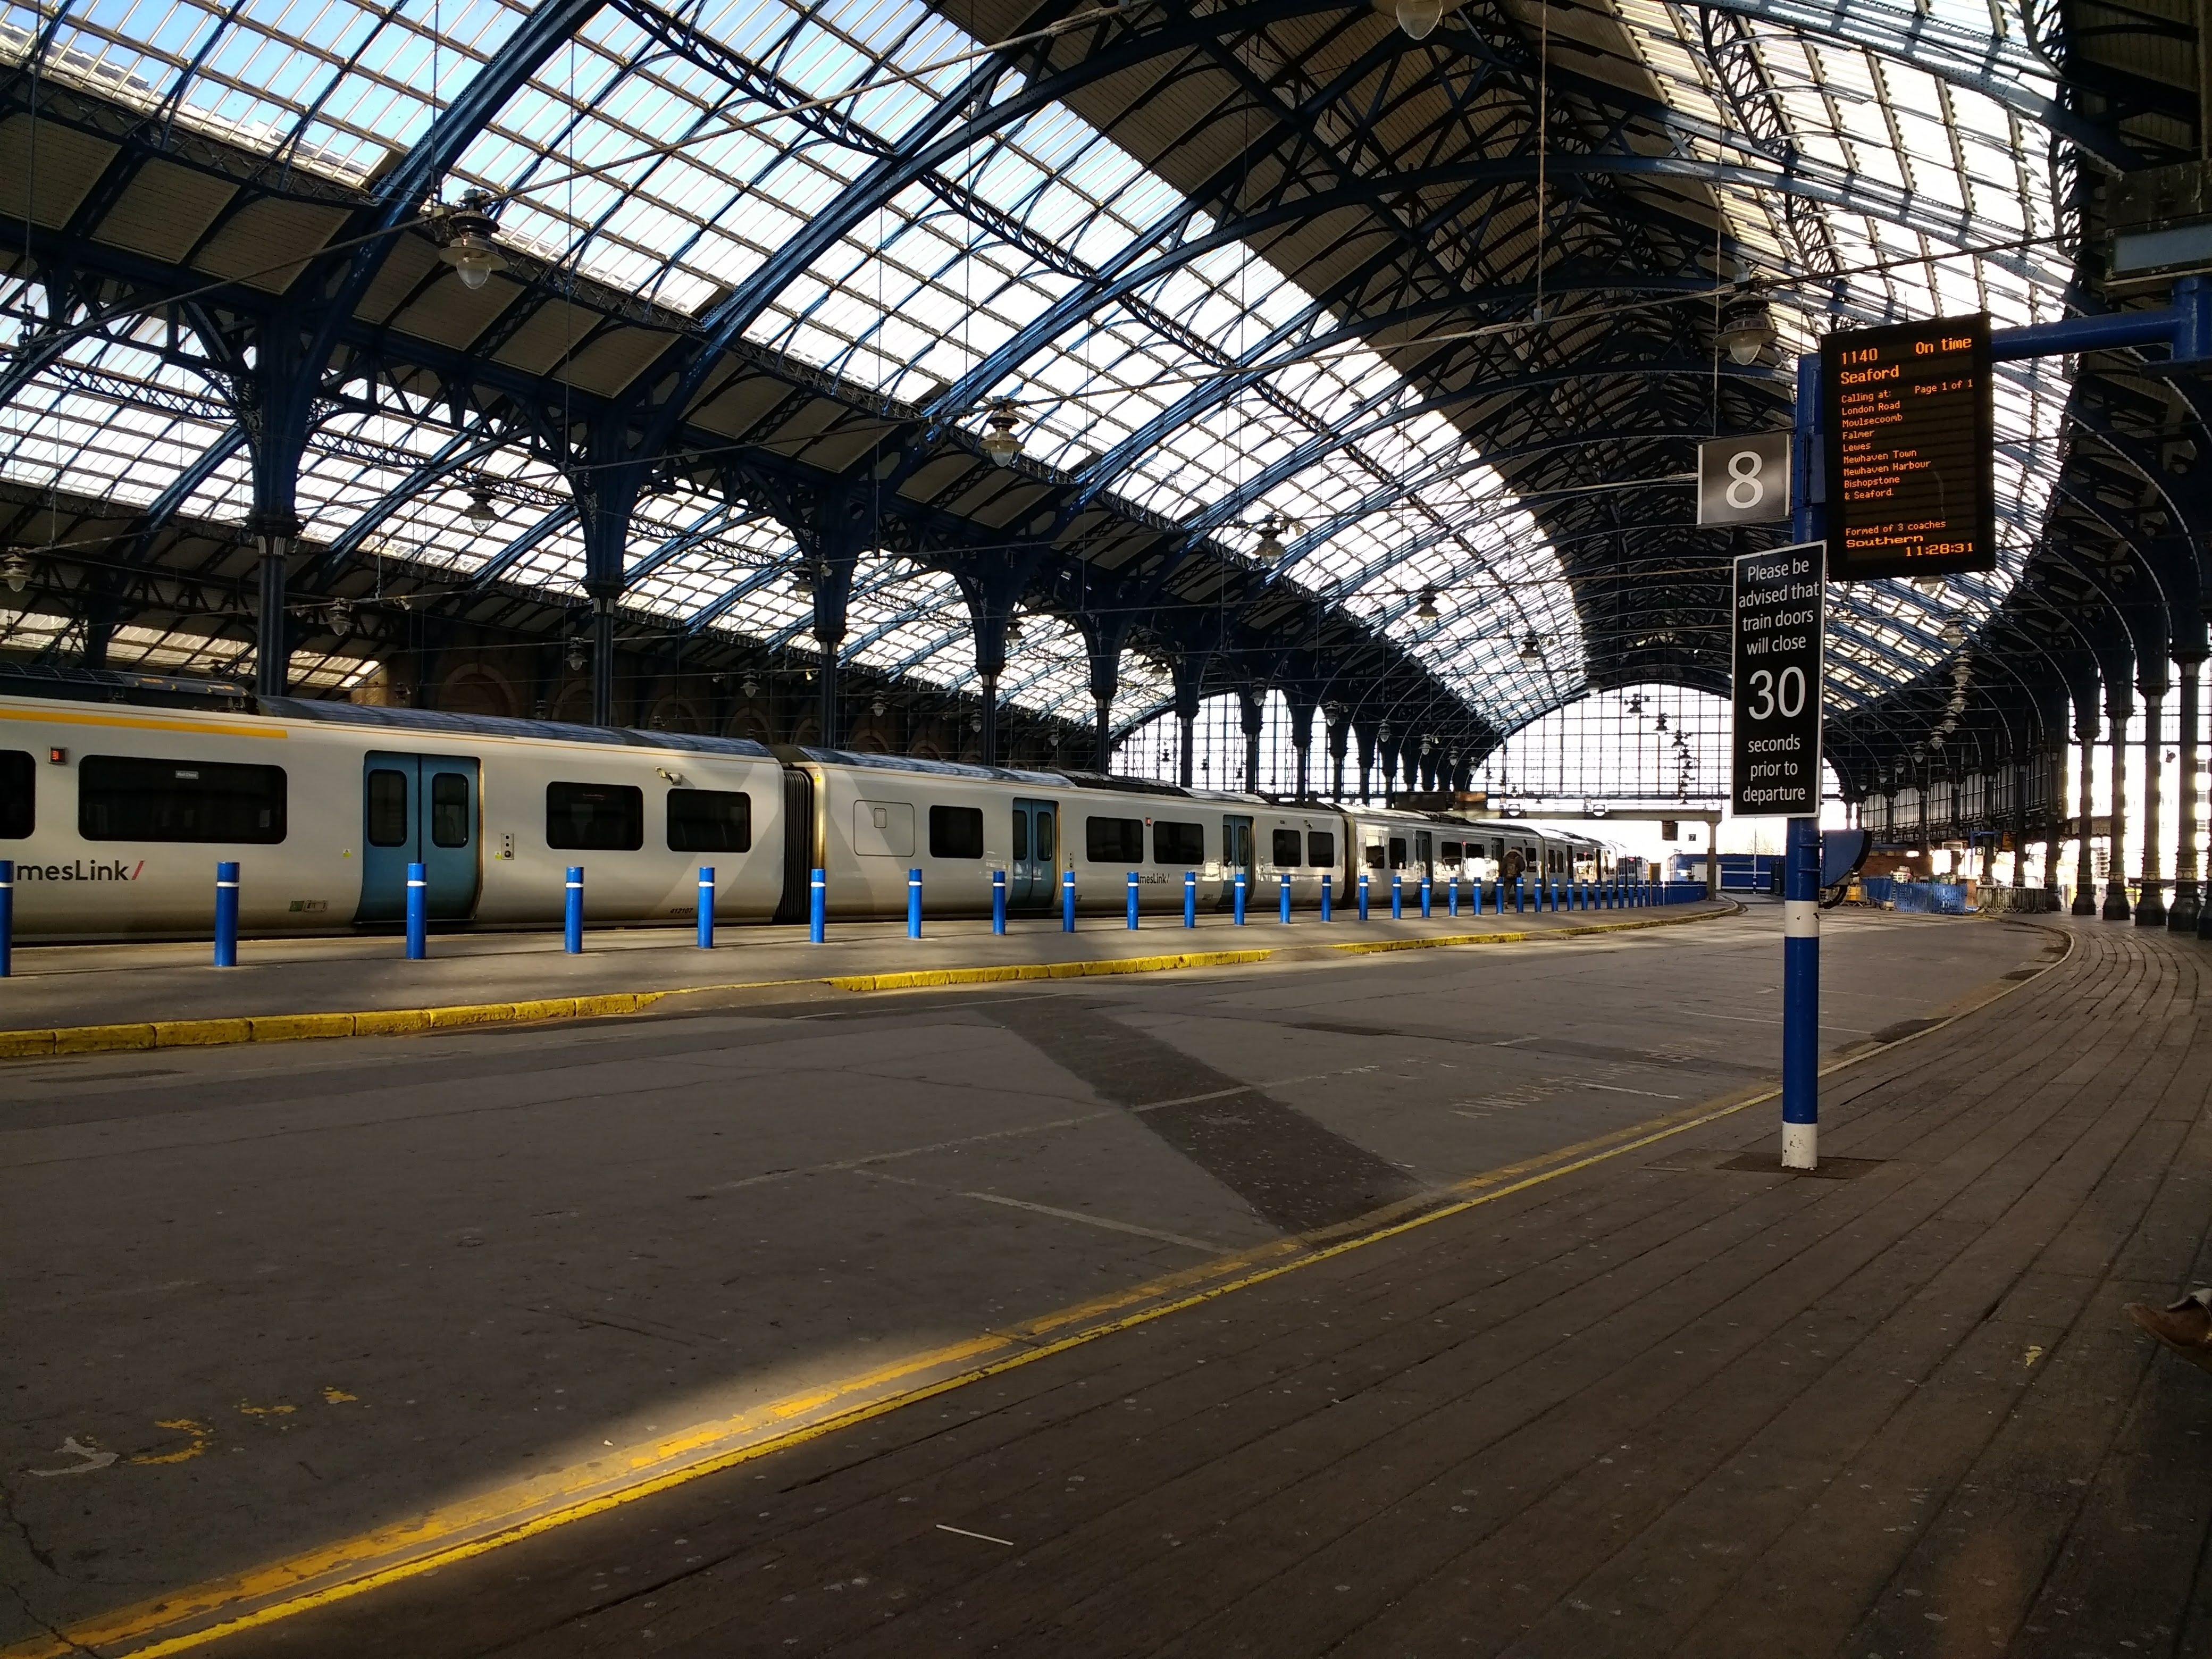 brighton to clapham junction train times